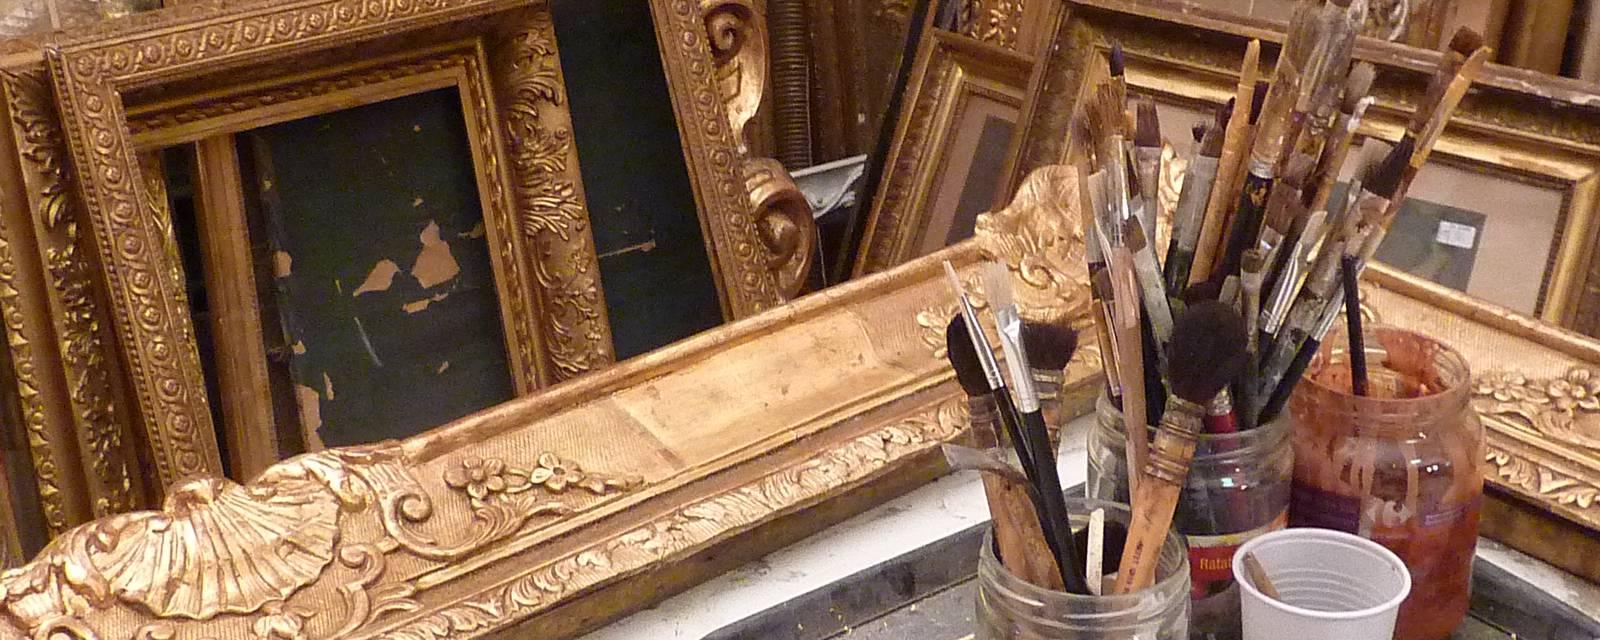 Artisans-saint-ouen